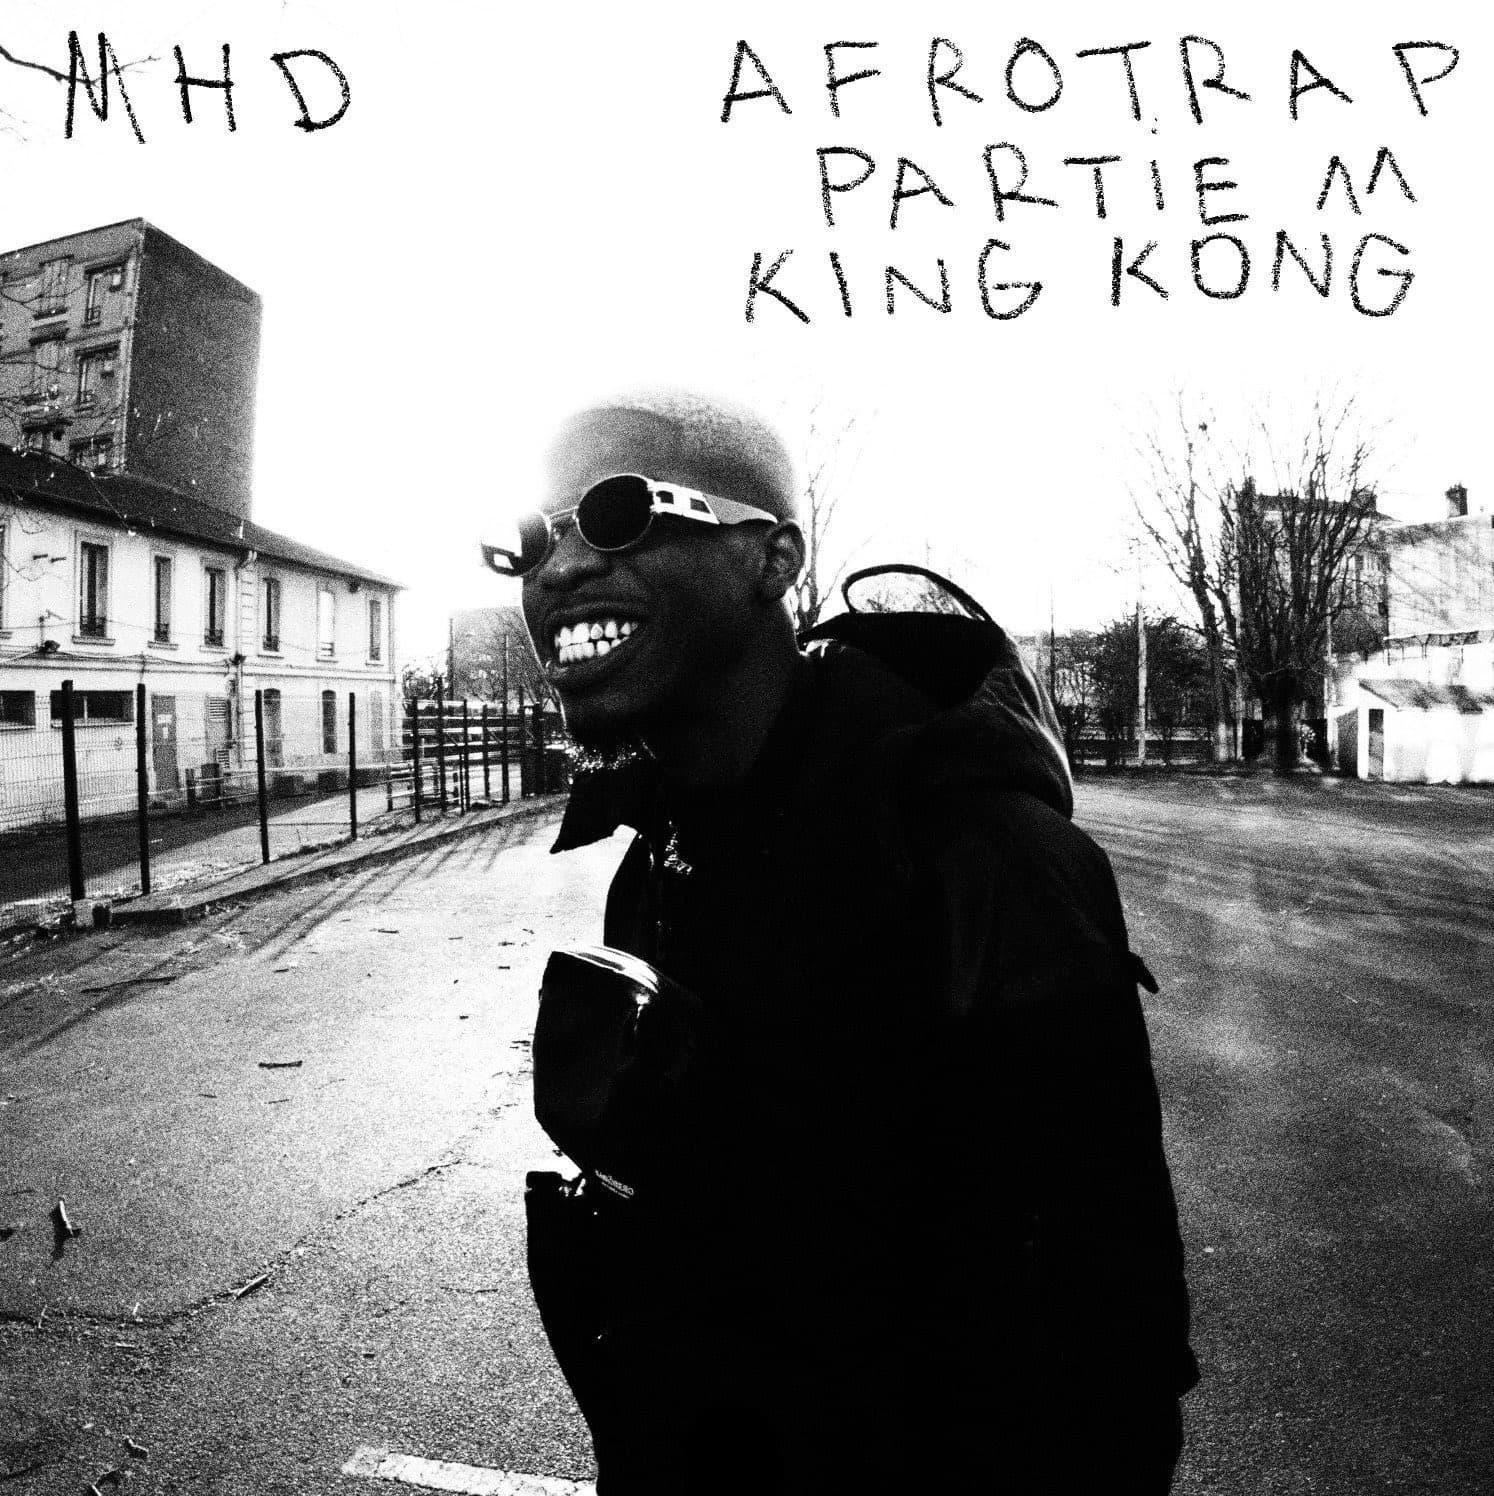 Afro Trap Part. 11 (King Kong) - Single